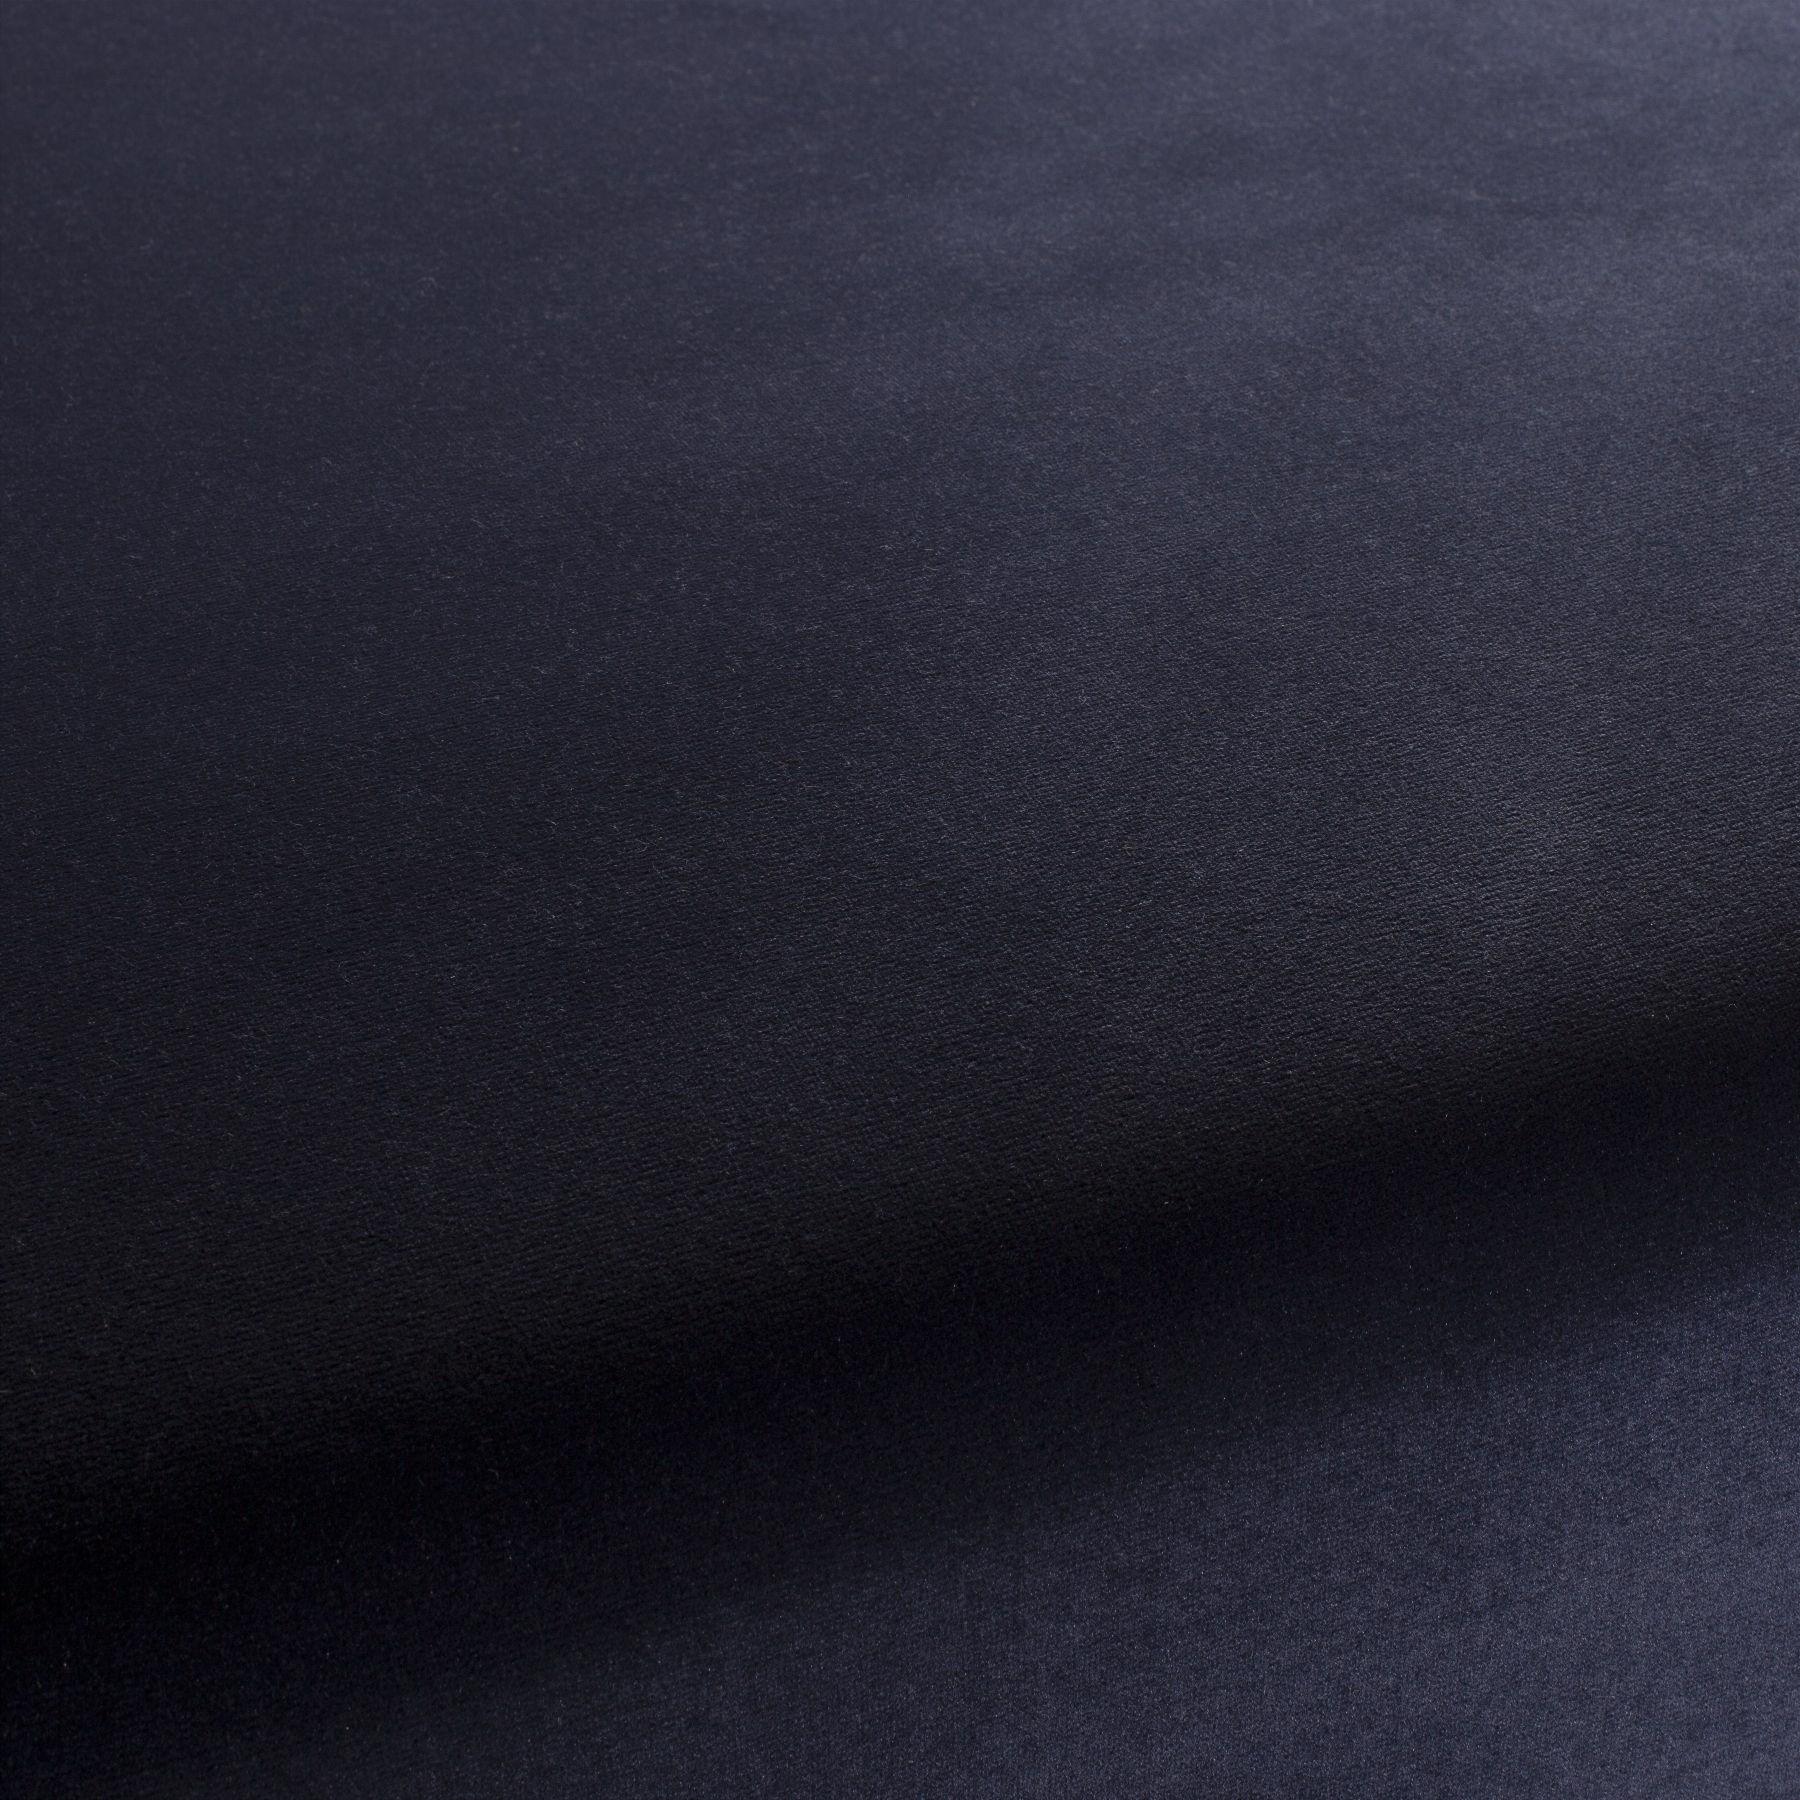 upholstery fabric velluto 1 3120 058 jab anstoetz fabrics. Black Bedroom Furniture Sets. Home Design Ideas